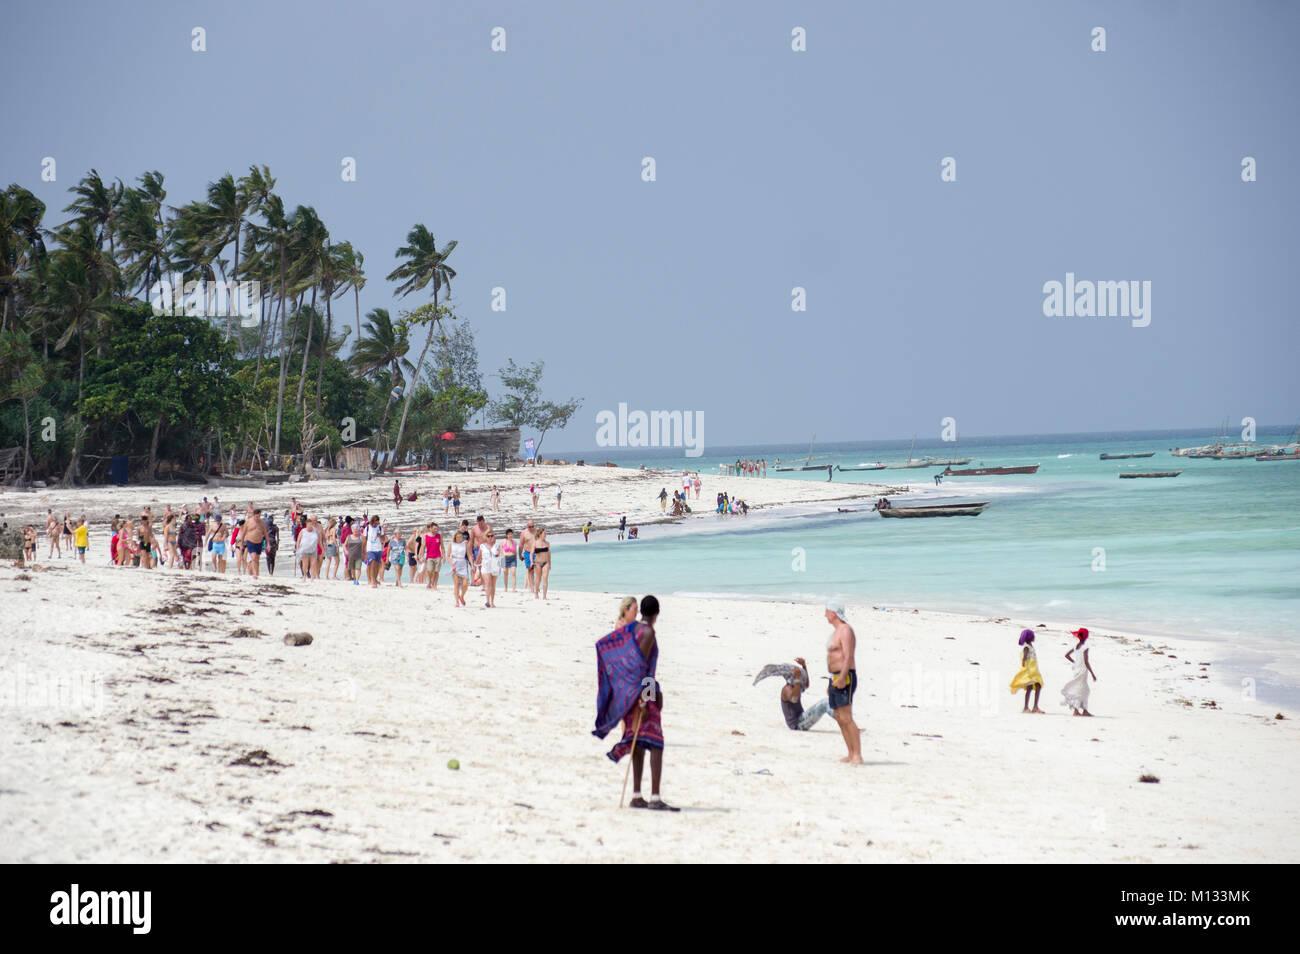 Mobs of Italian tourists descend upon the beach in Nungwi, Zanzibar, Tanzania, to visit the Mnarani Marine Turtles - Stock Image